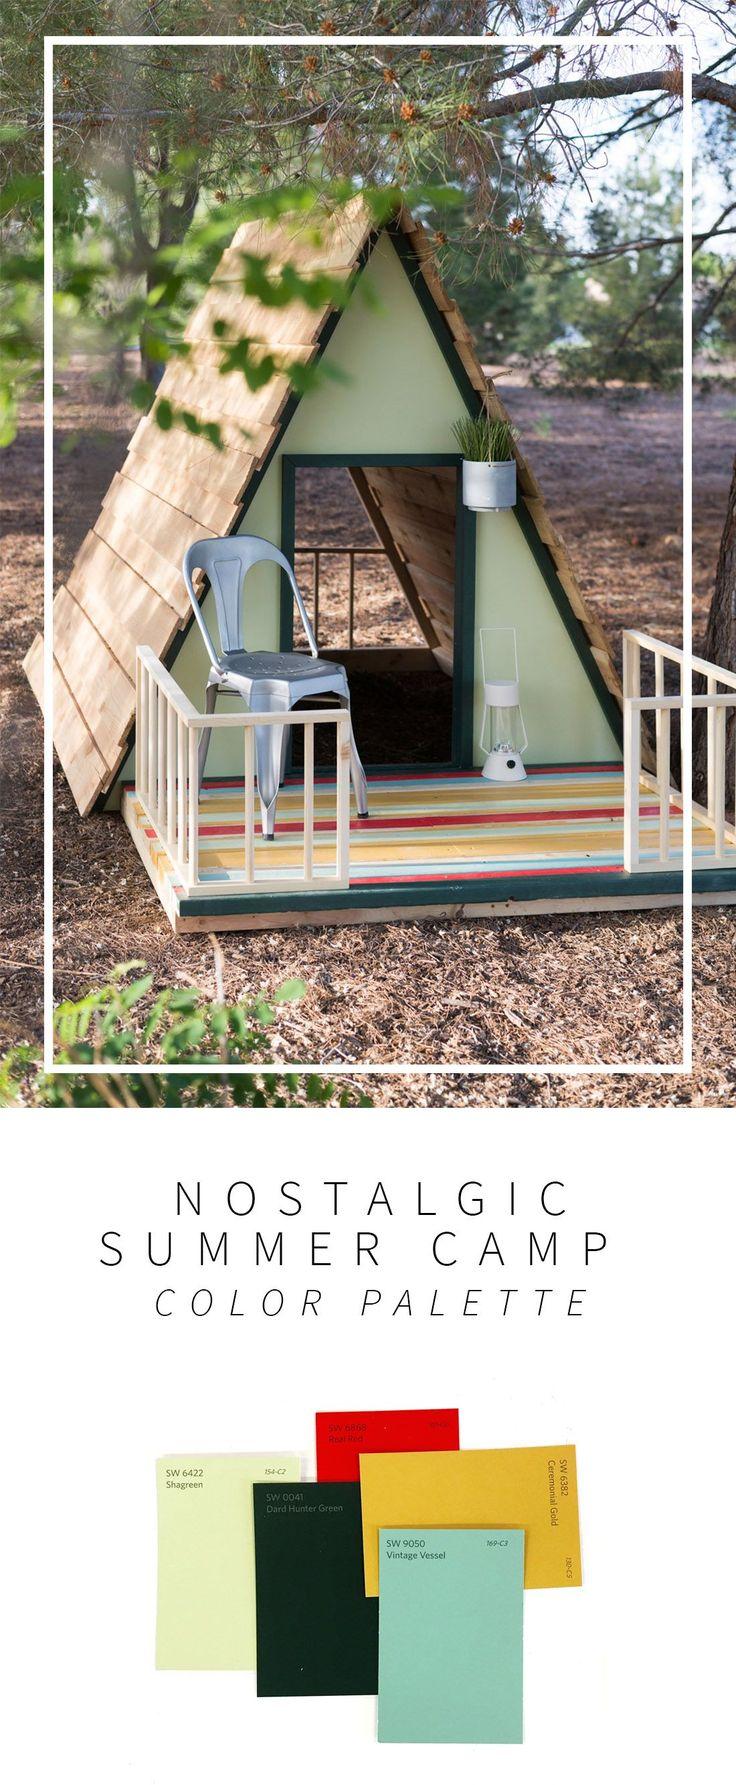 Nostalgic Summer Camp DIY Playhouse | Vintage Revivals